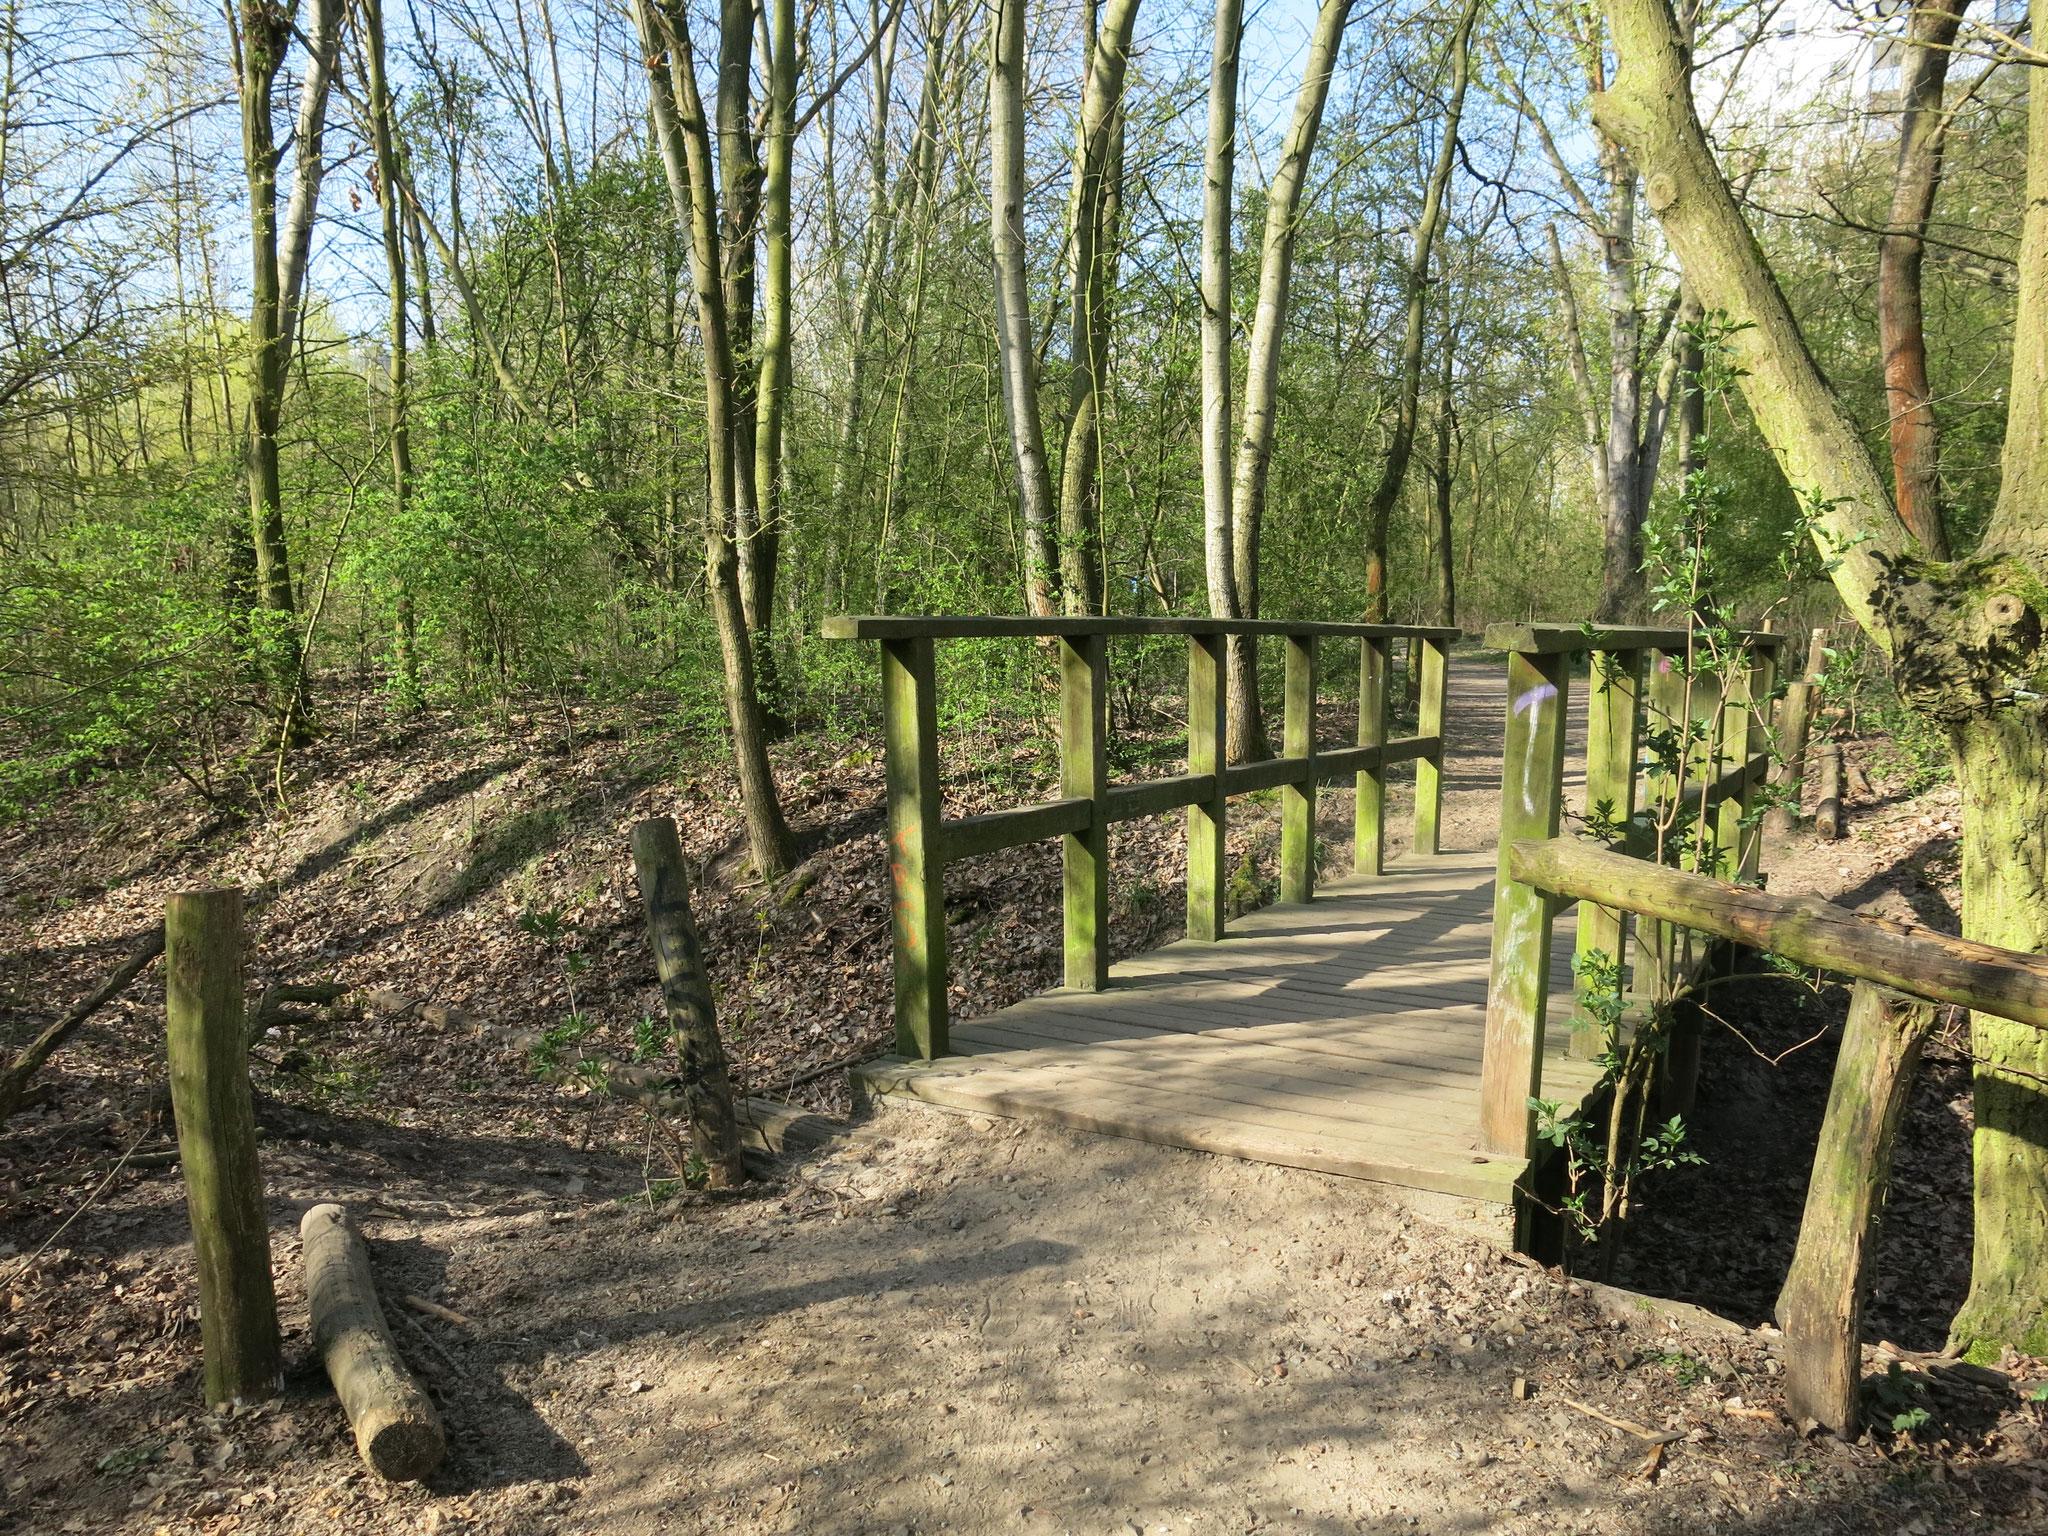 Tipp 3: Wuhle-Hönow-Weg